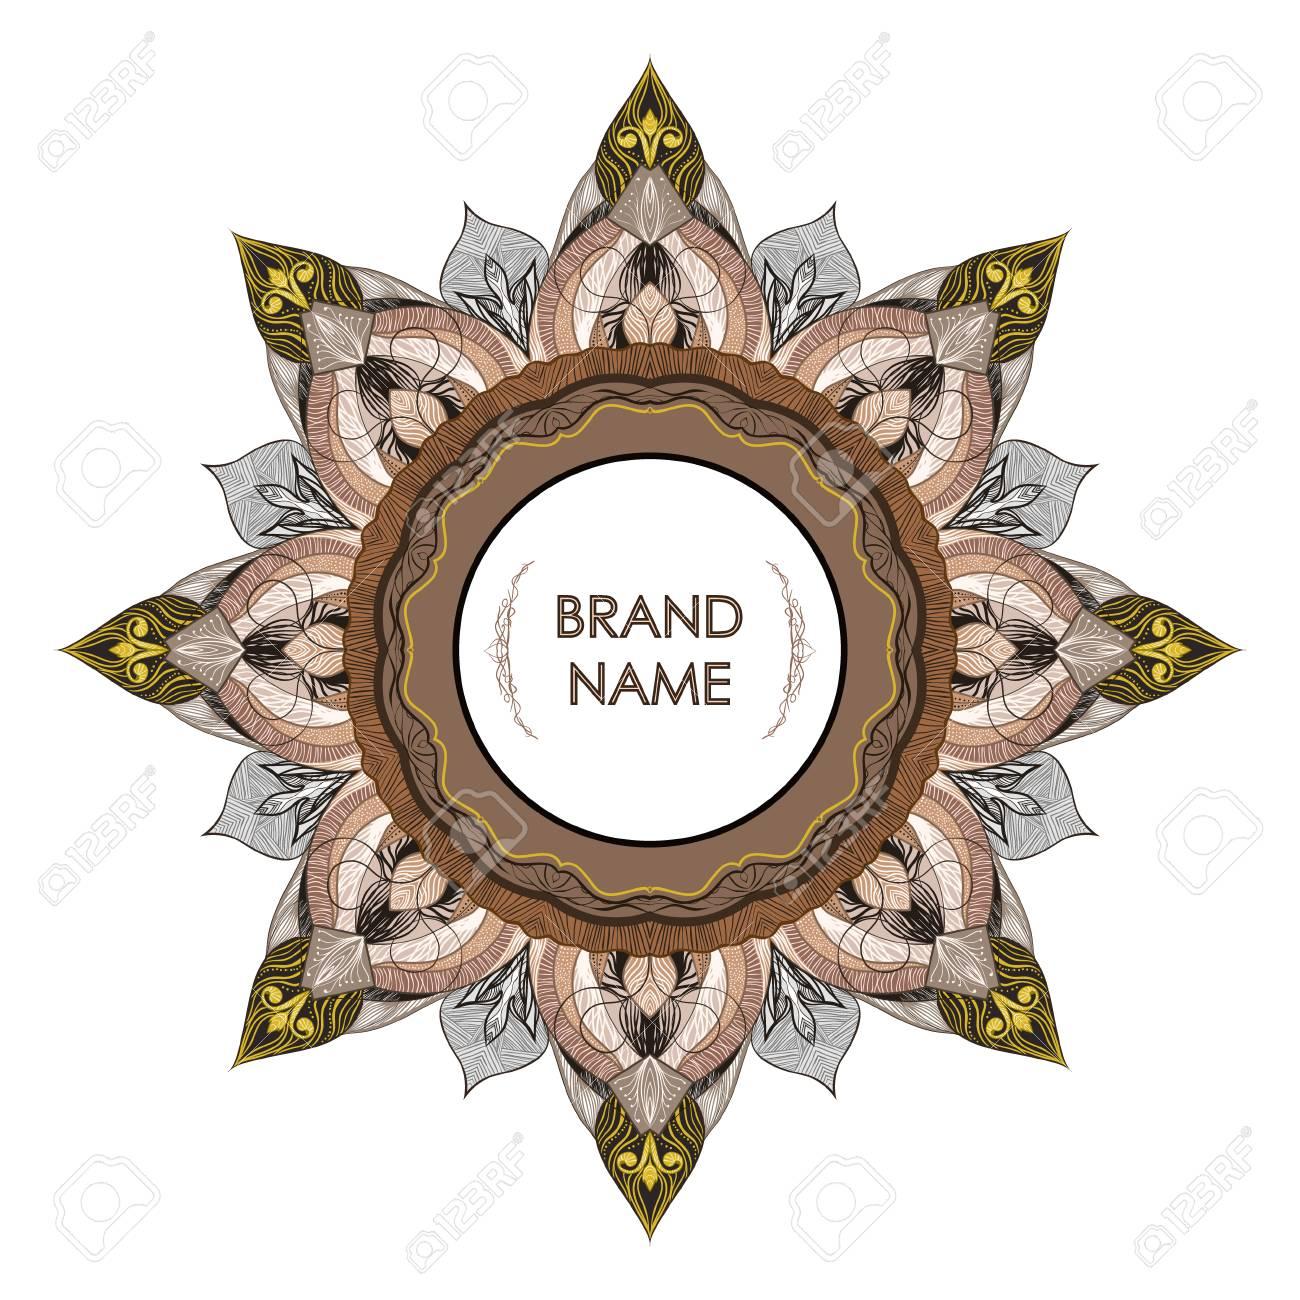 Vintage symmetrical decorative frame for text. Floral filigree detailing elegant style of drawing - empty space for brand name. Printing on envelopes, premium invitation, glasses, business card, stamp - 104765127